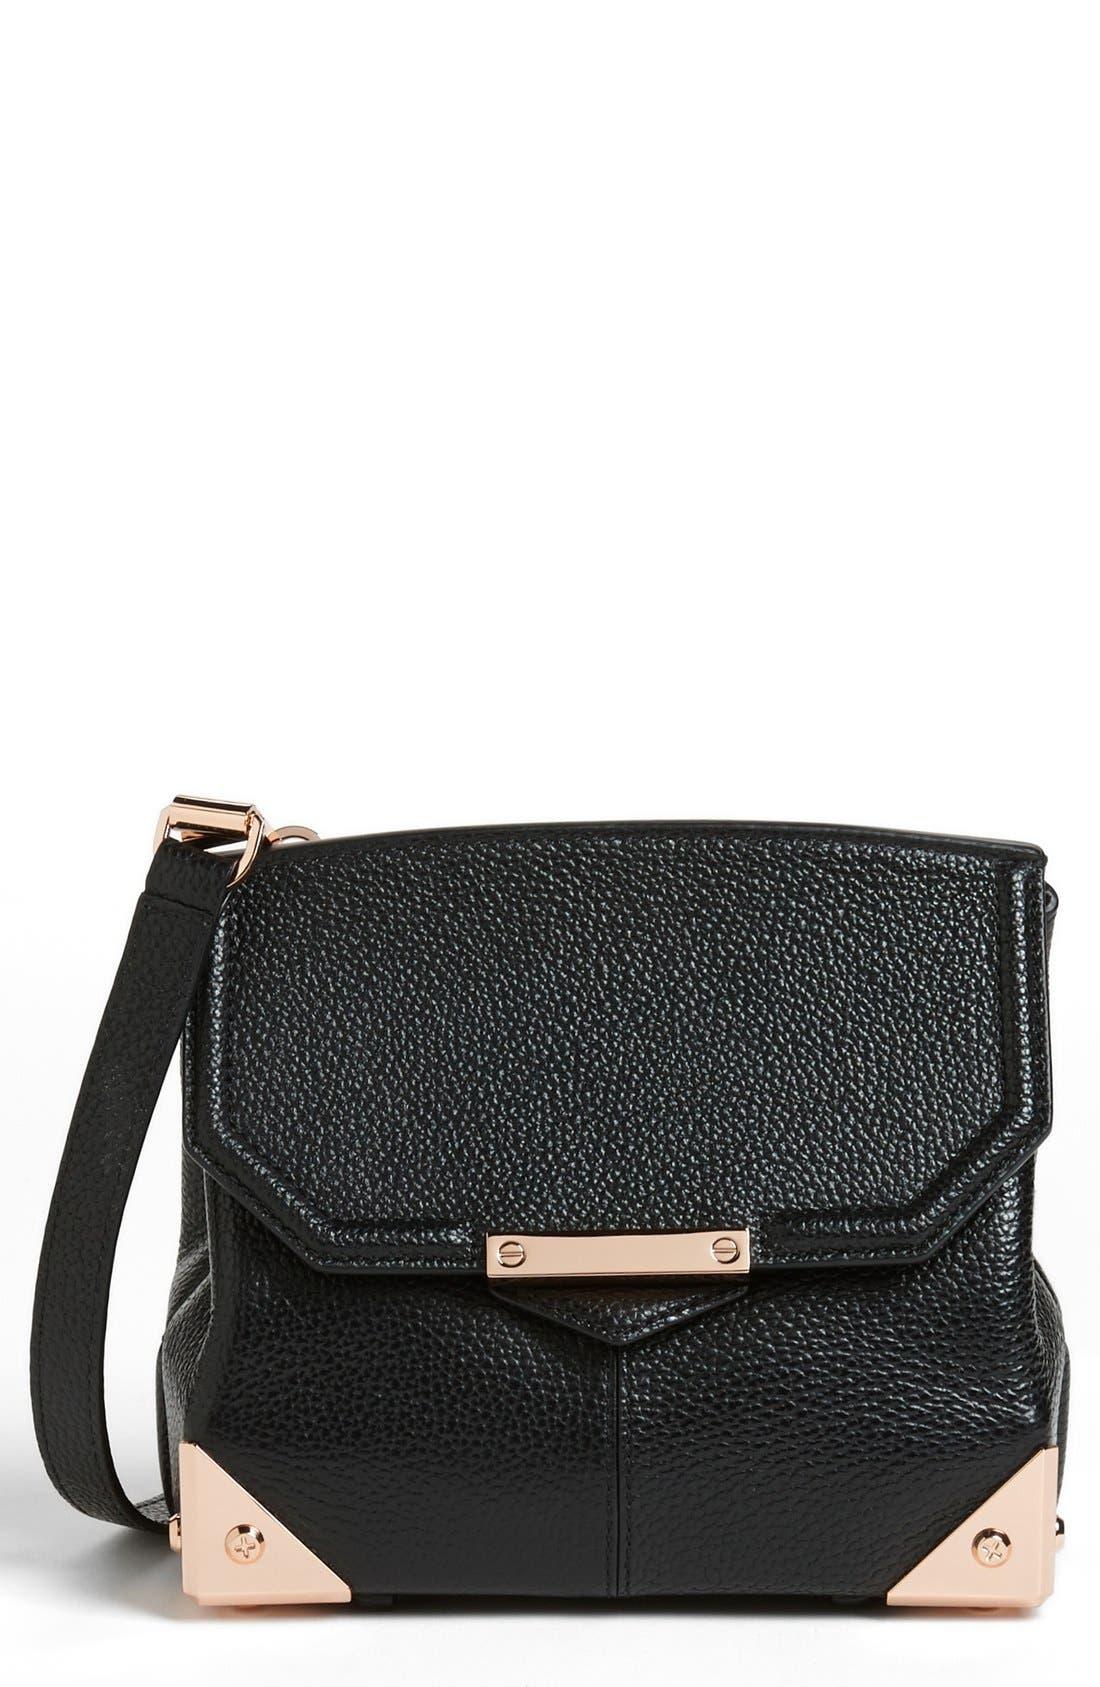 Main Image - Alexander Wang 'Marion - Prisma' Leather Crossbody Bag